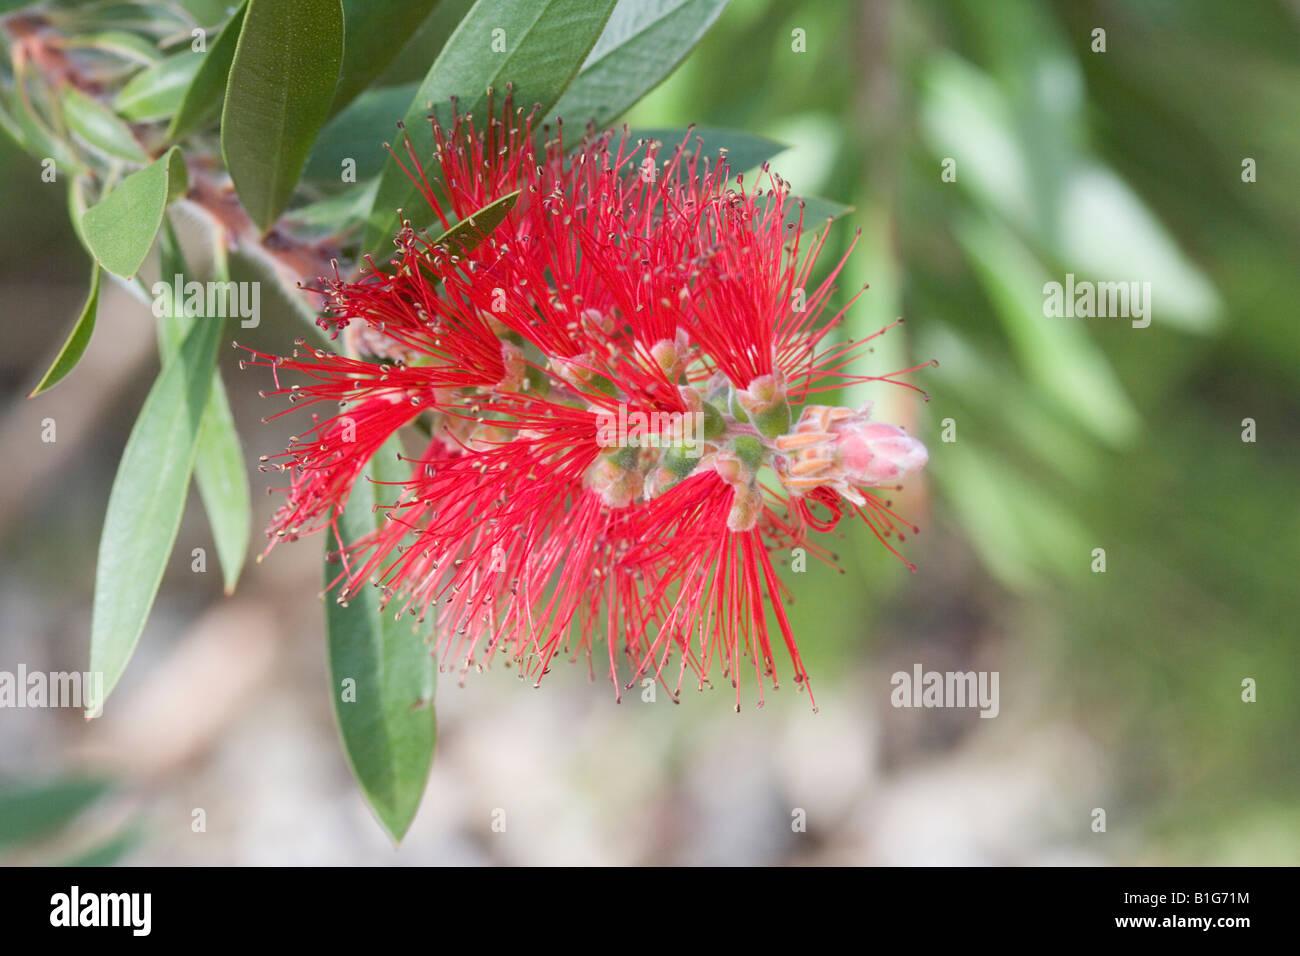 Bottlebrush Callistemon Myrtaceae - Stock Image